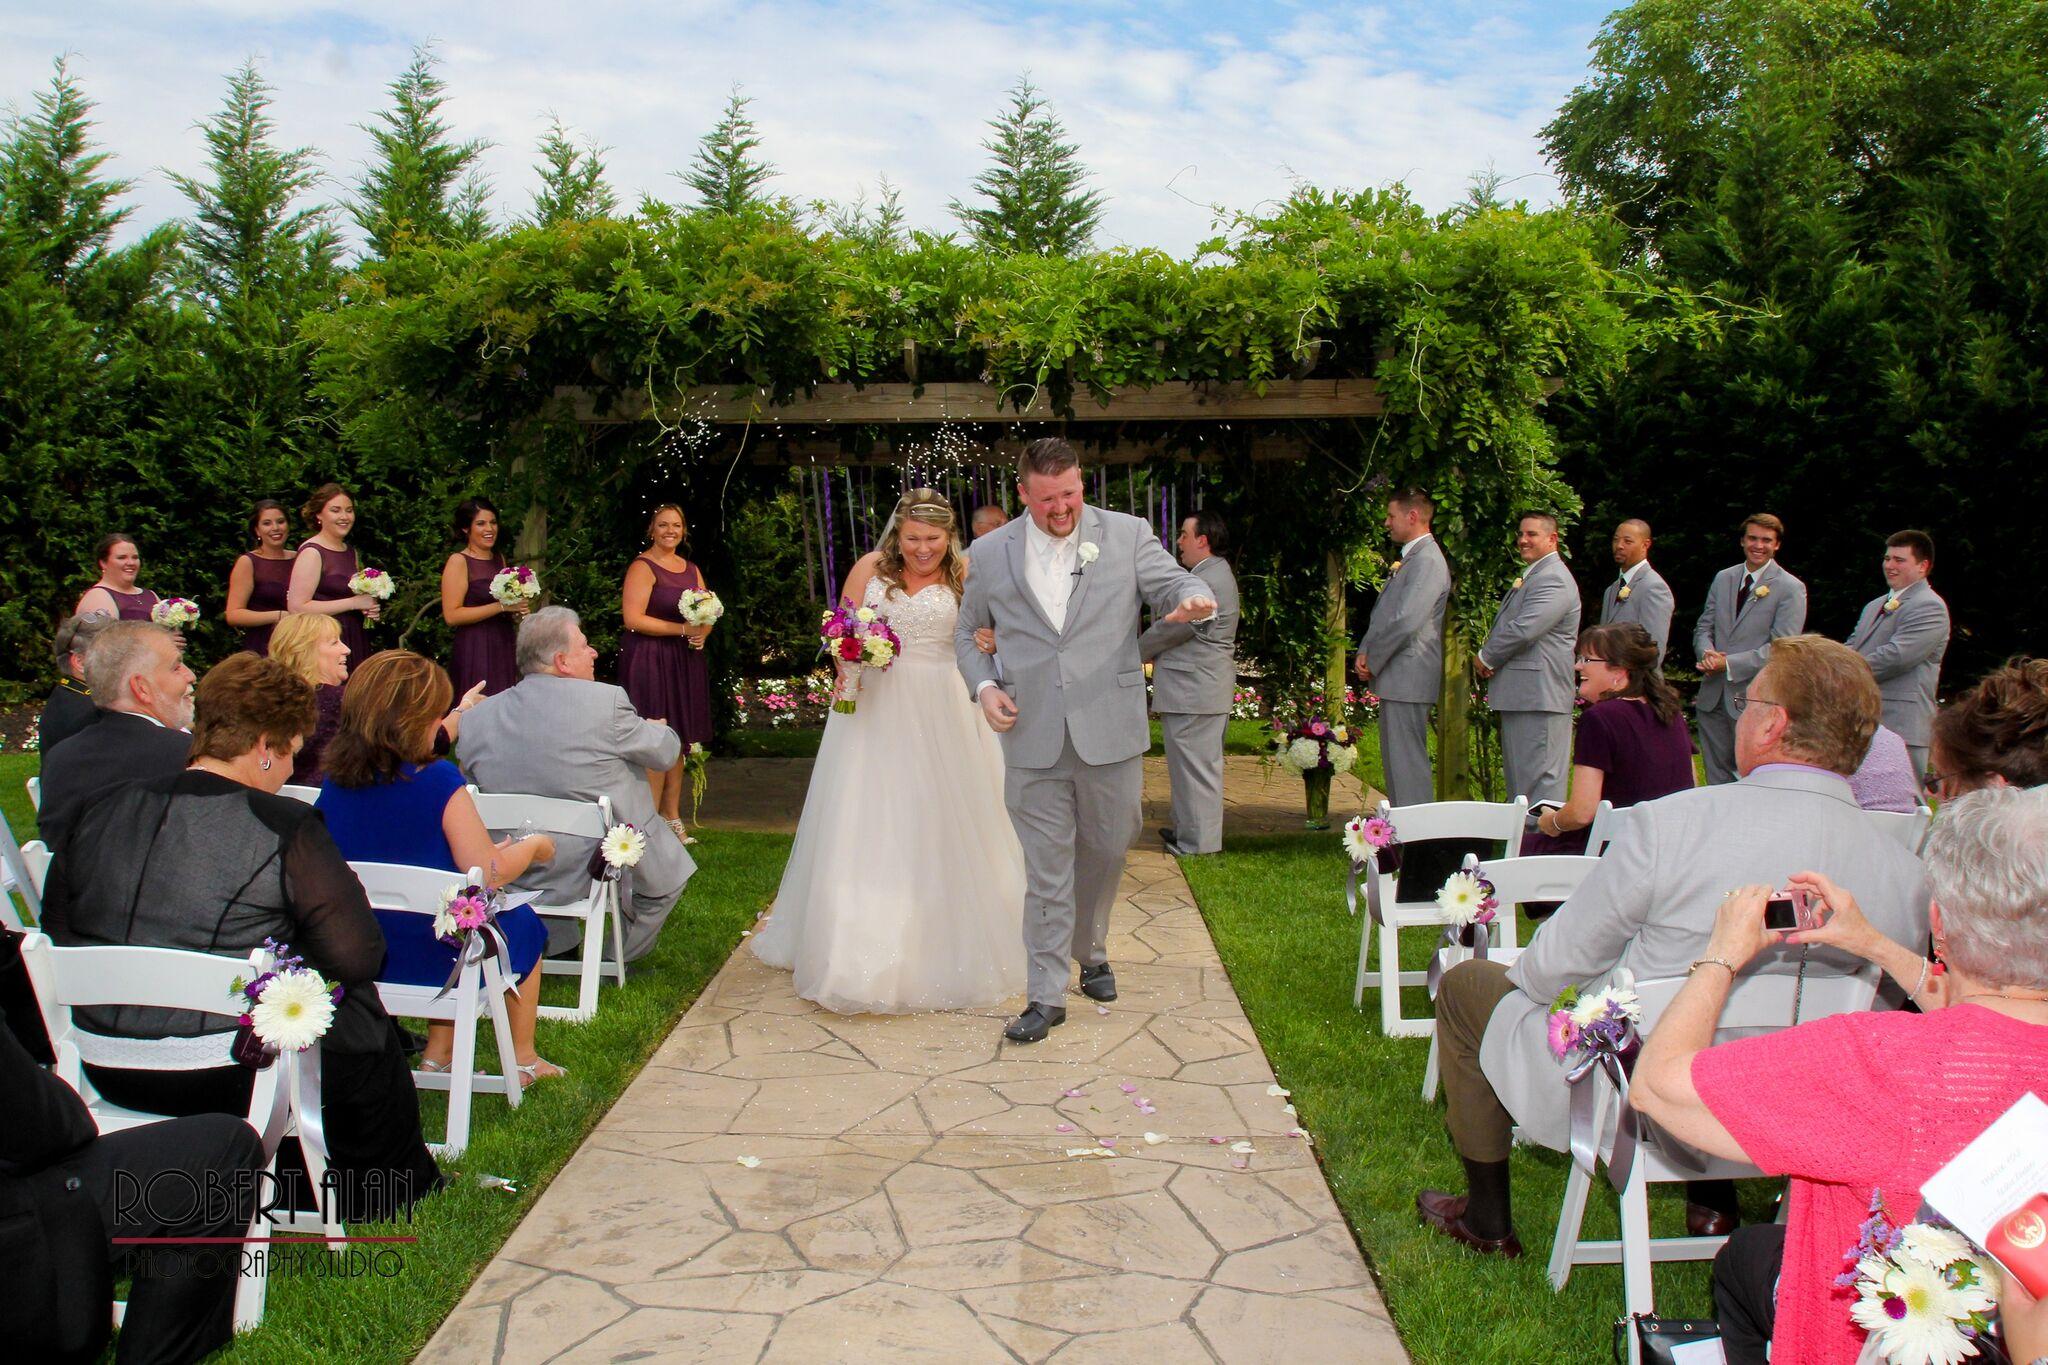 Outdoor Weddings Eastlyn Golf Course The Greenview Inn